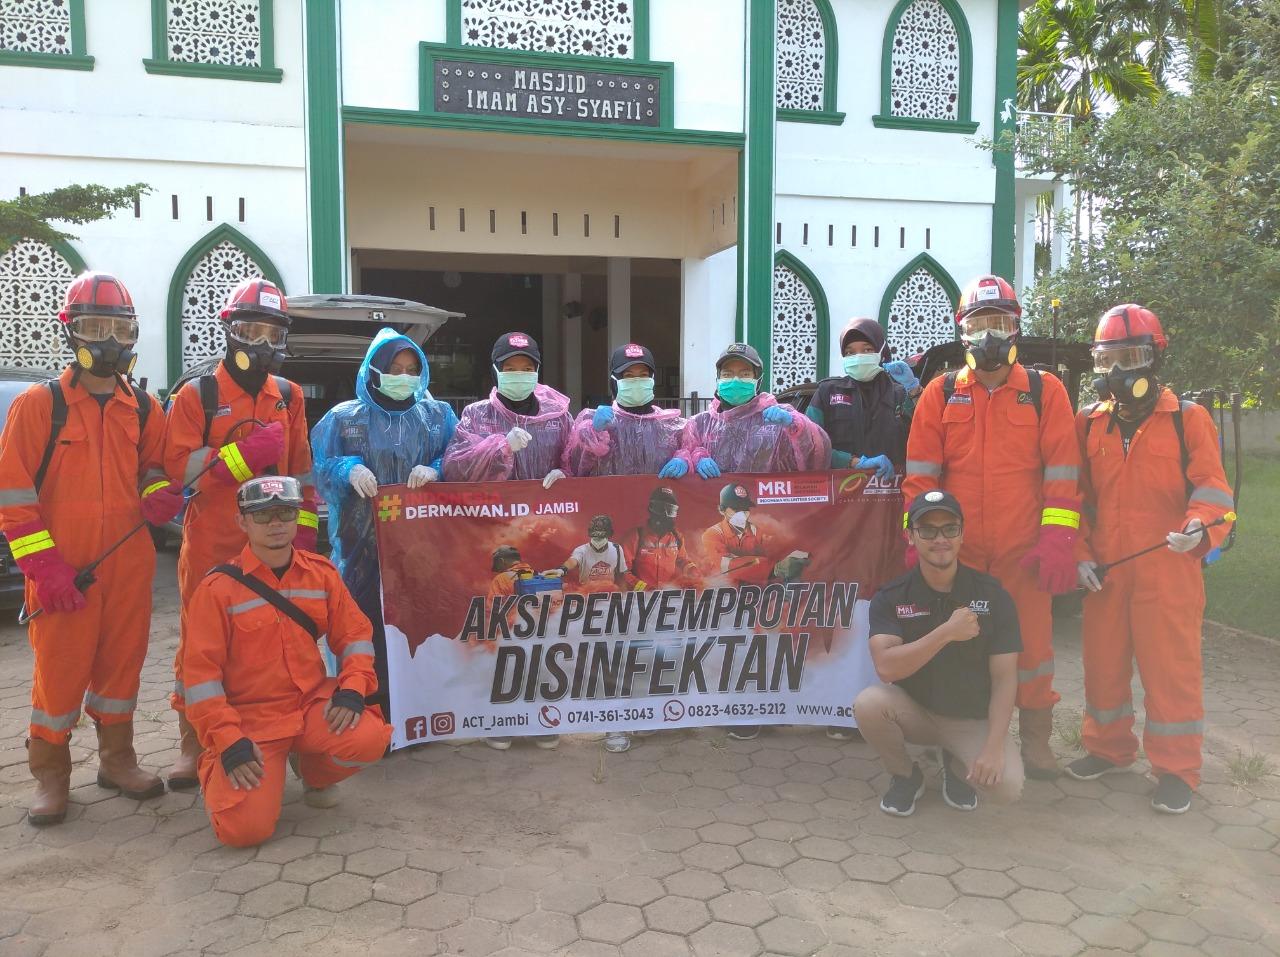 Bersama UMKM, ACT Jambi laksanakan Operasi Pangan Gratis di RSUD Raden Mattaher